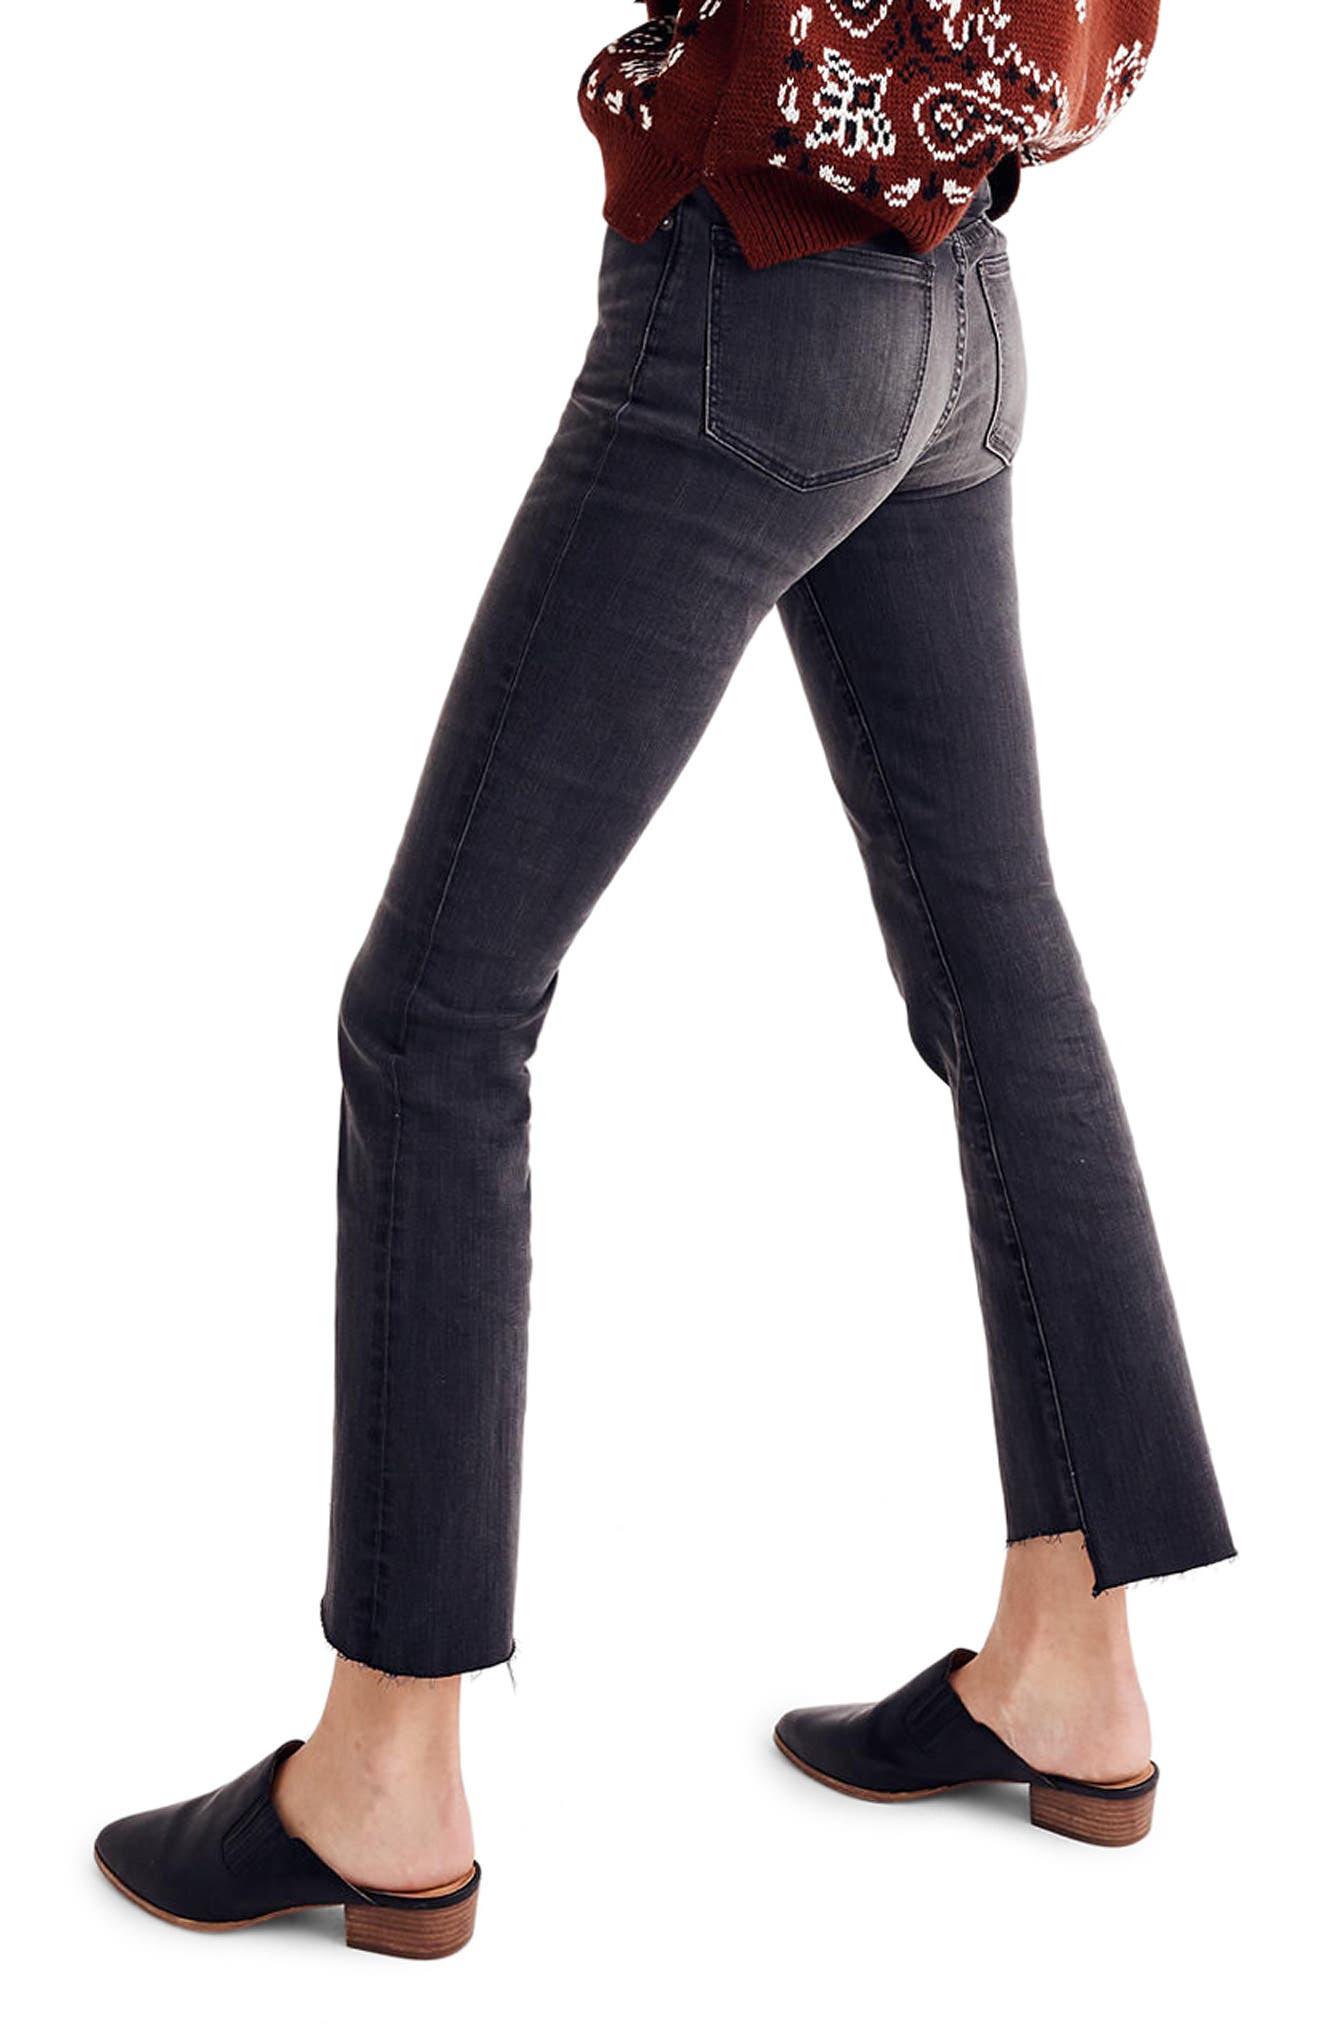 Cali Demi Bootcut Crop Jeans,                             Alternate thumbnail 2, color,                             Woodston Wash